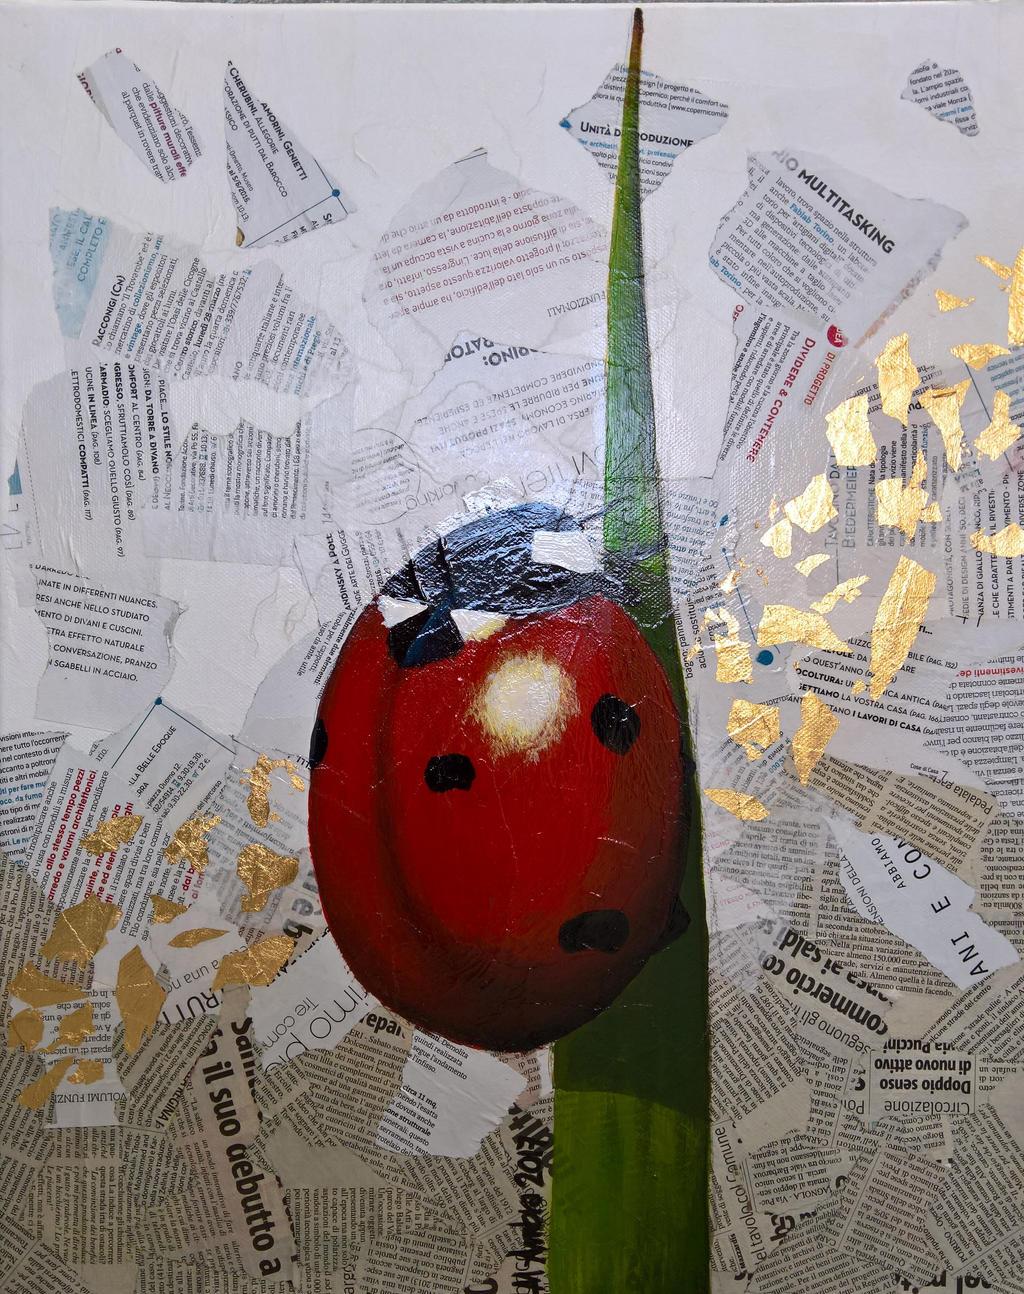 Ladybird by flysch